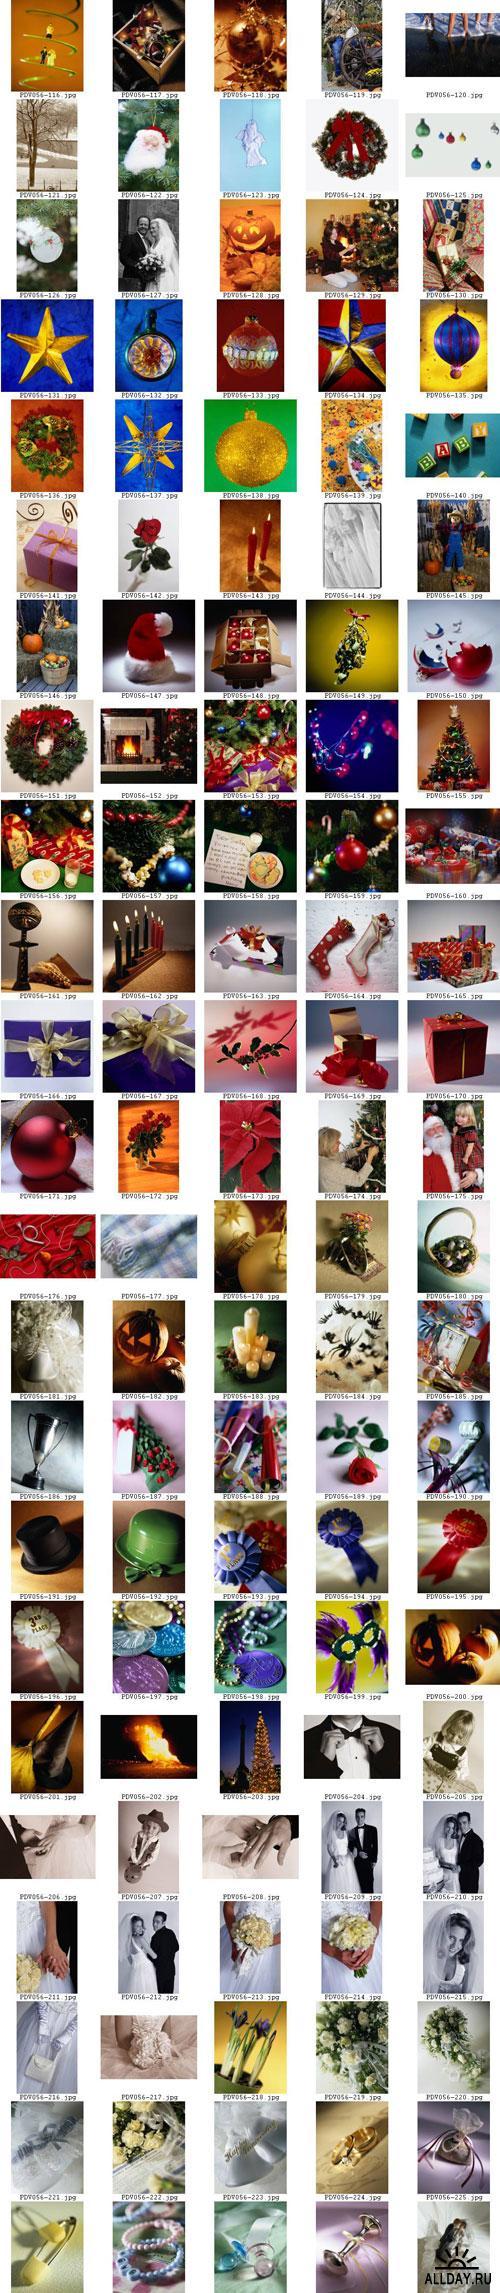 PhotoDisc V056: Holidays, Celebrations & Seasons